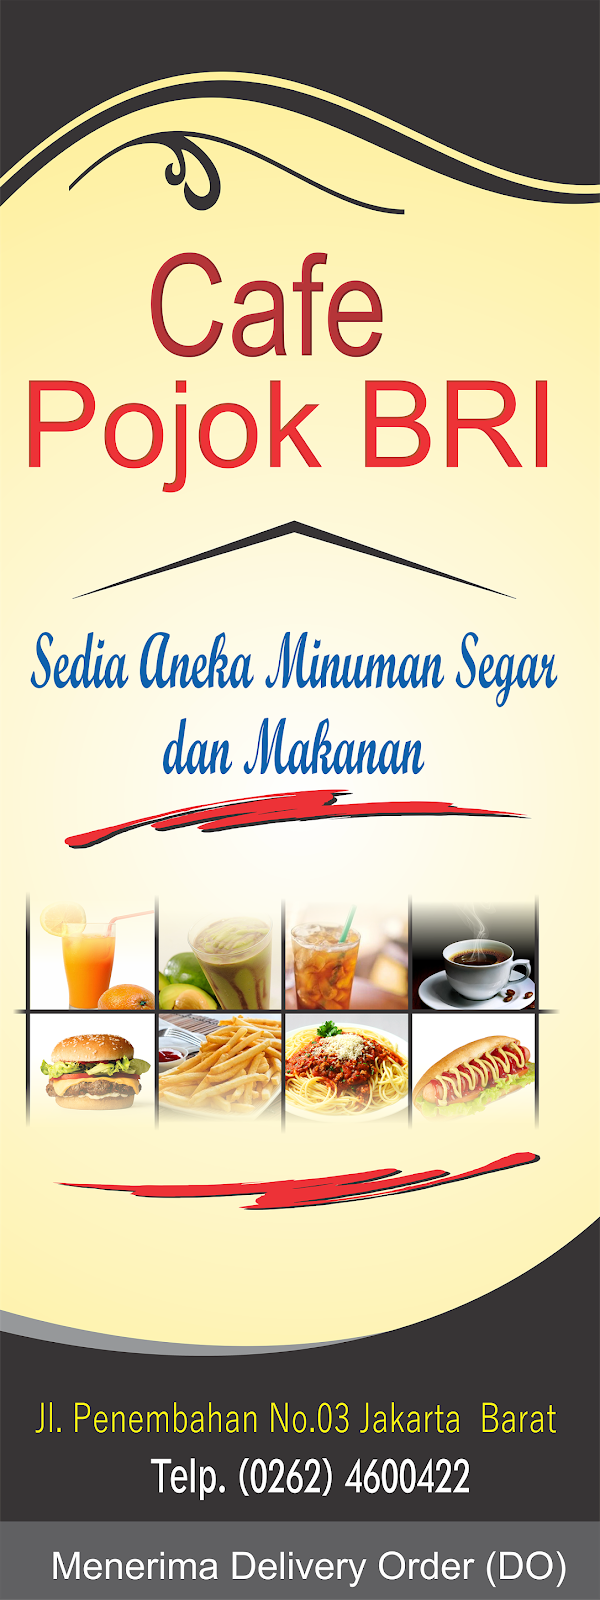 Desain X Banner Makanan Minuman - desain spanduk kreatif